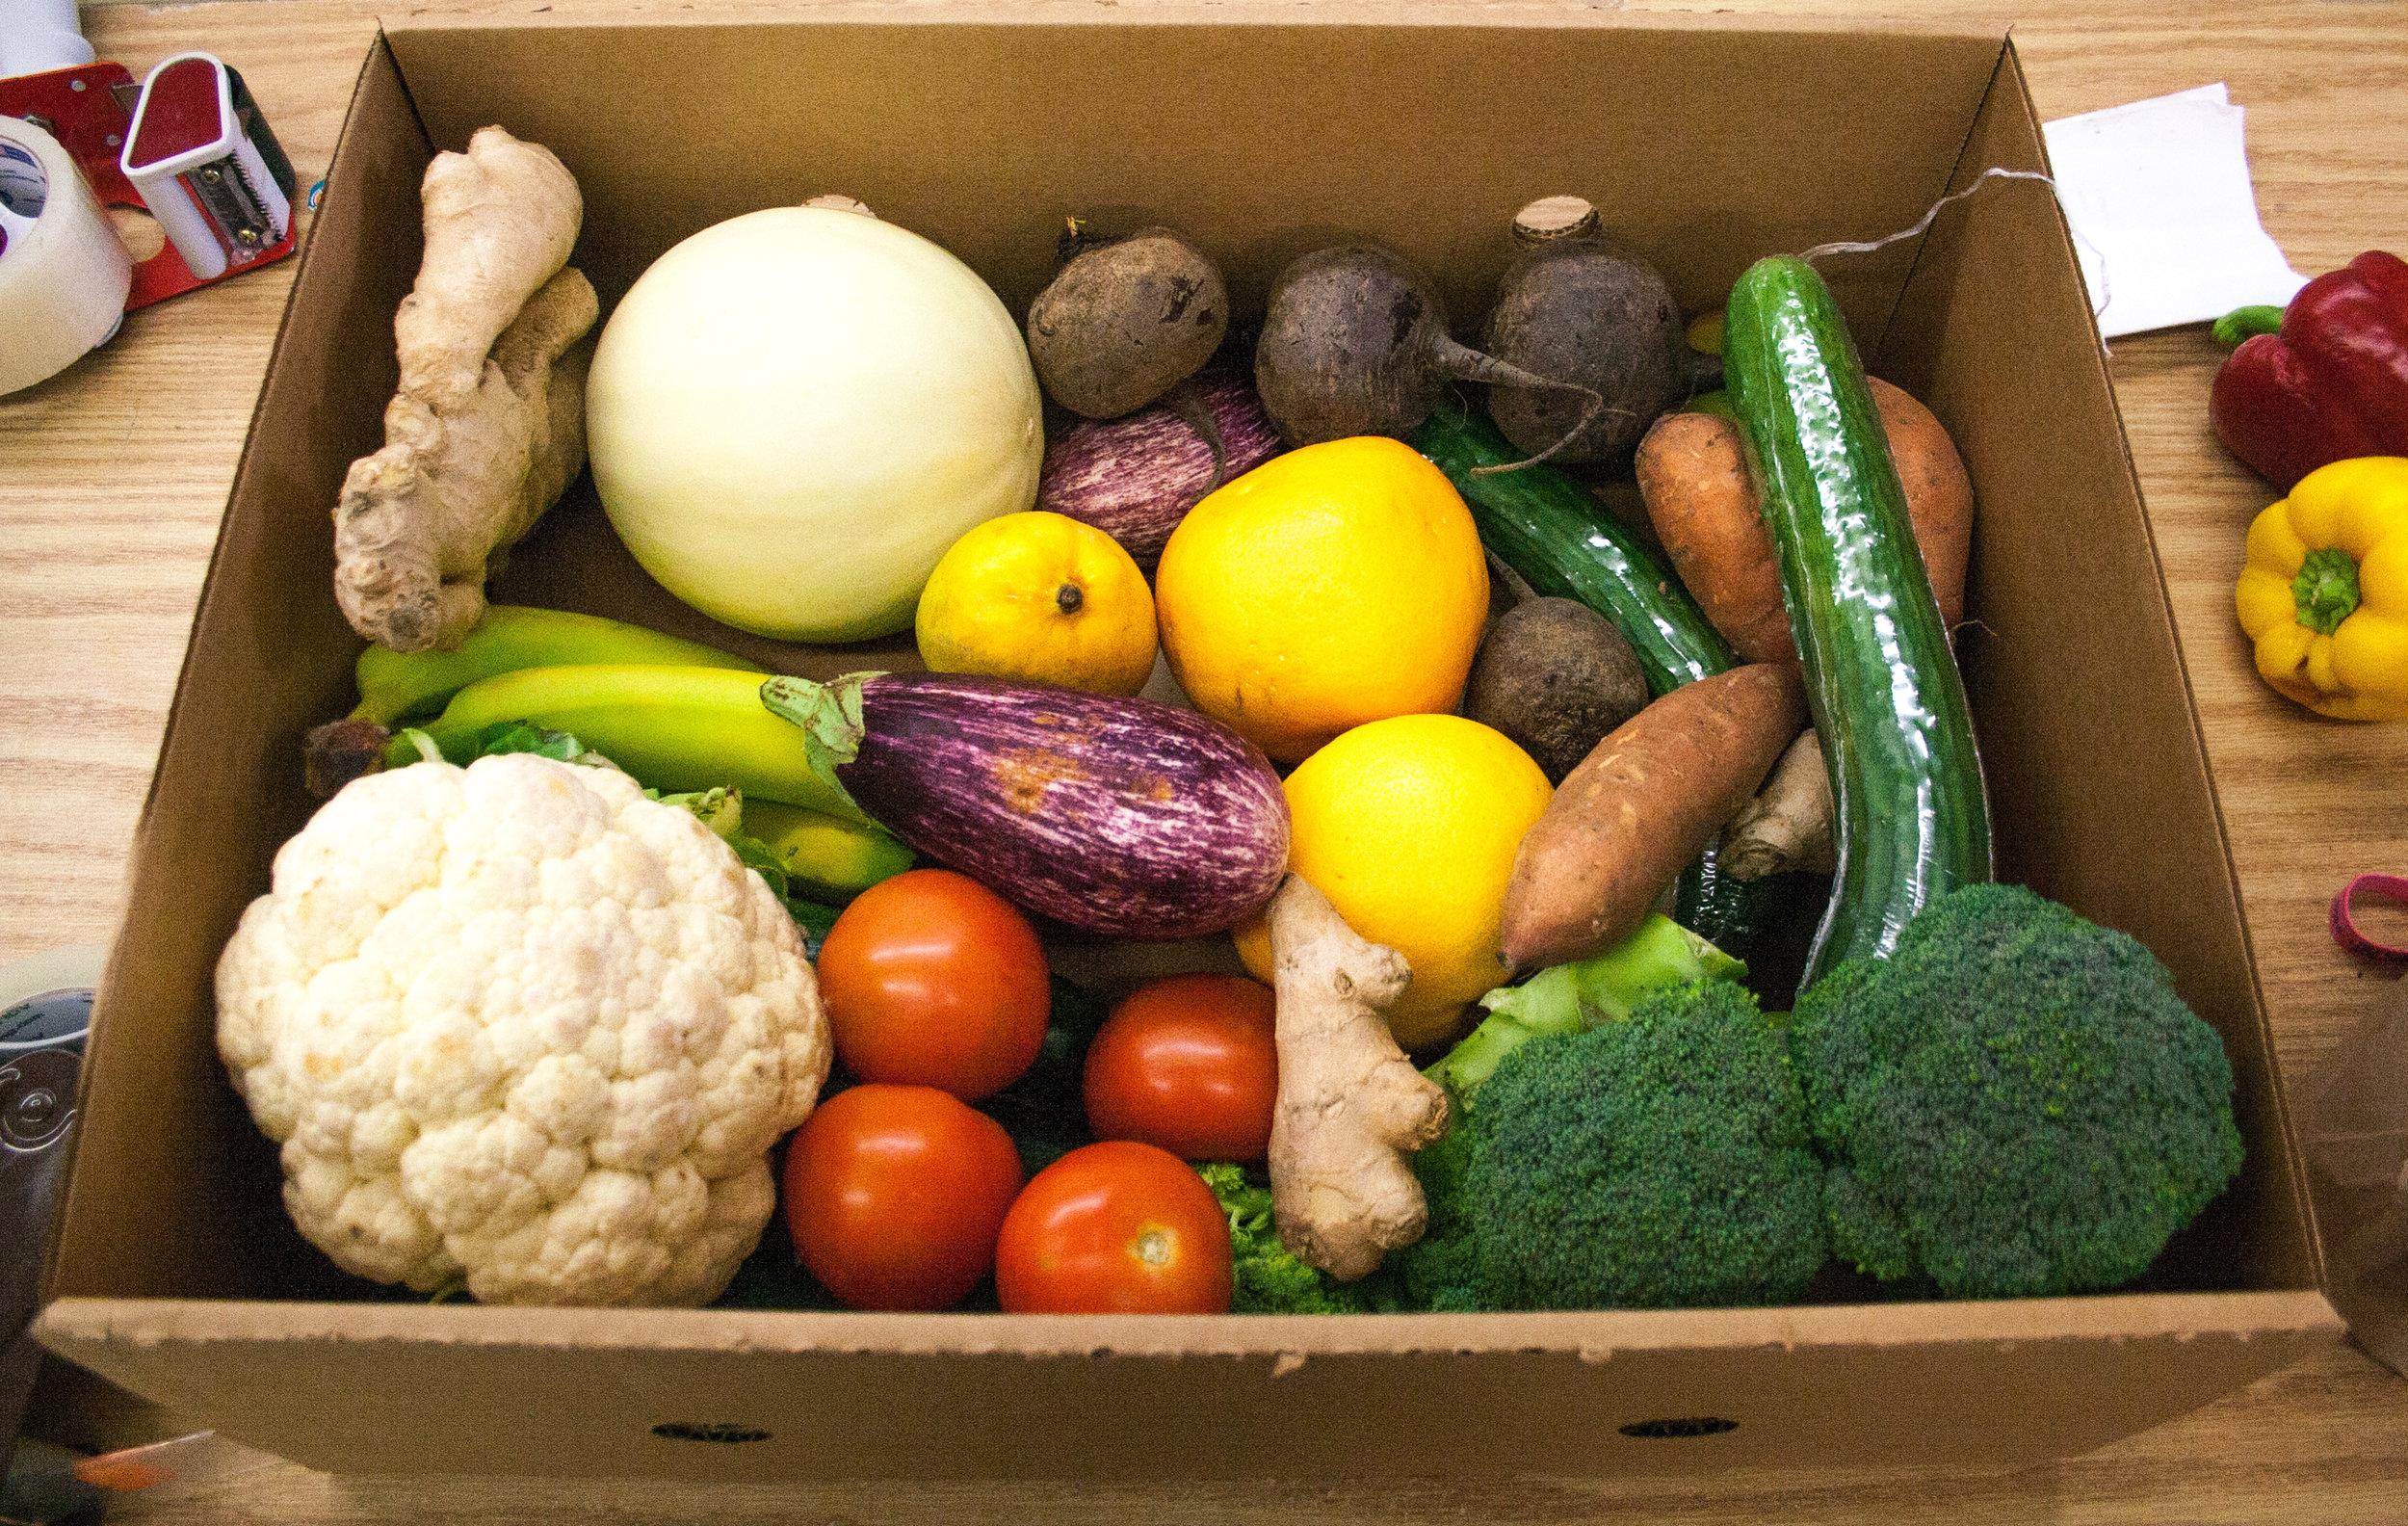 Mixed veggie and fruit box